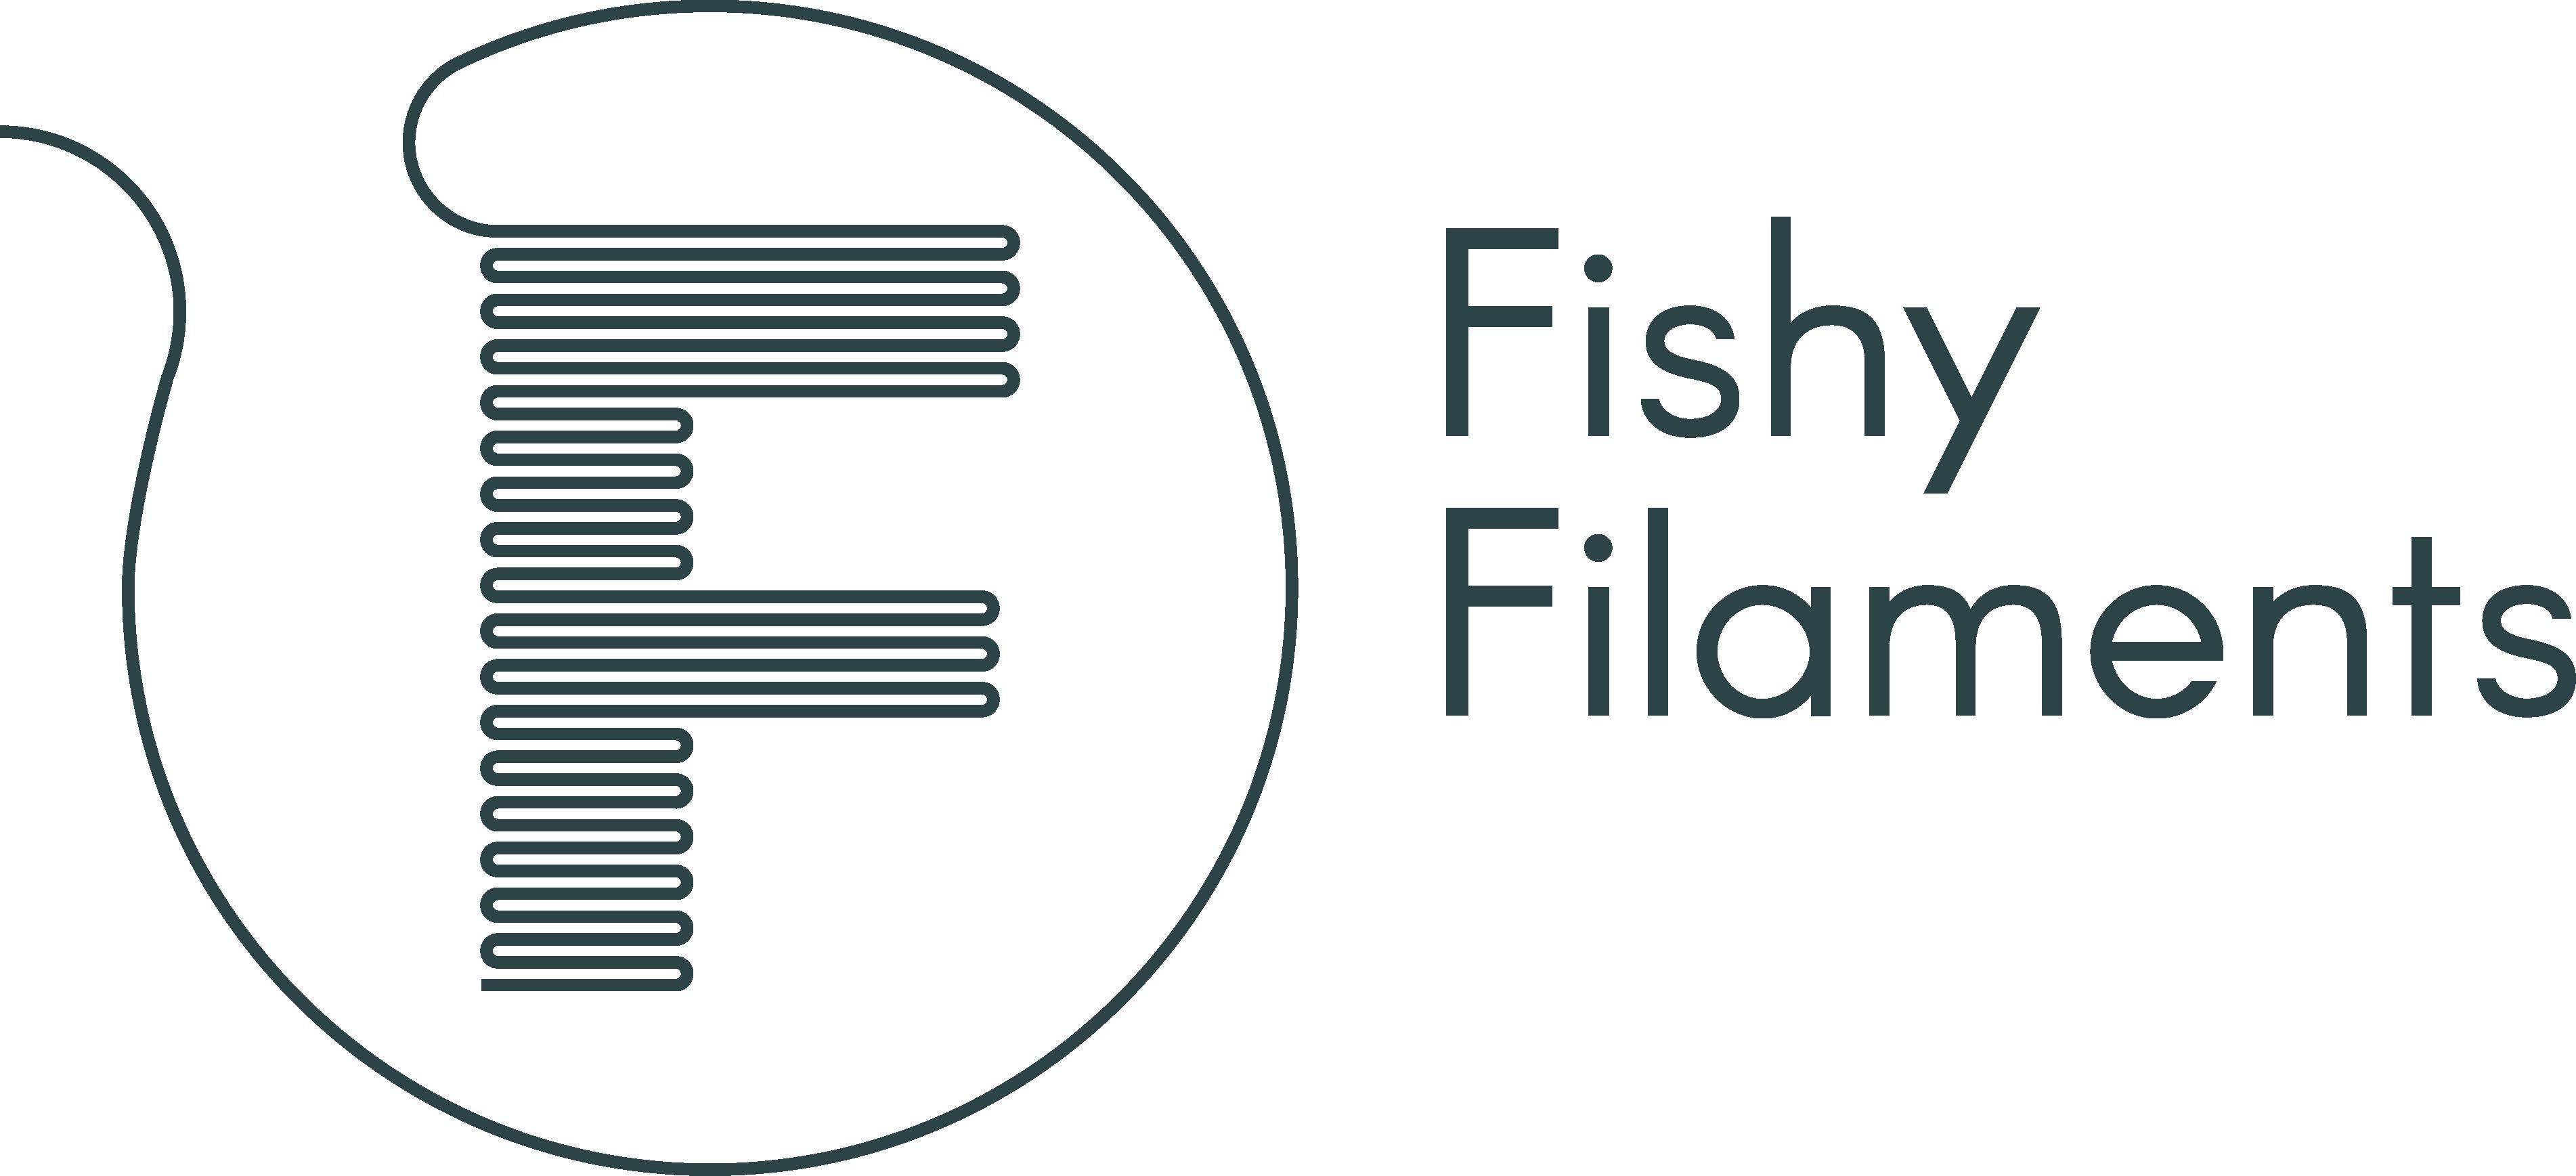 Fishy filament logo